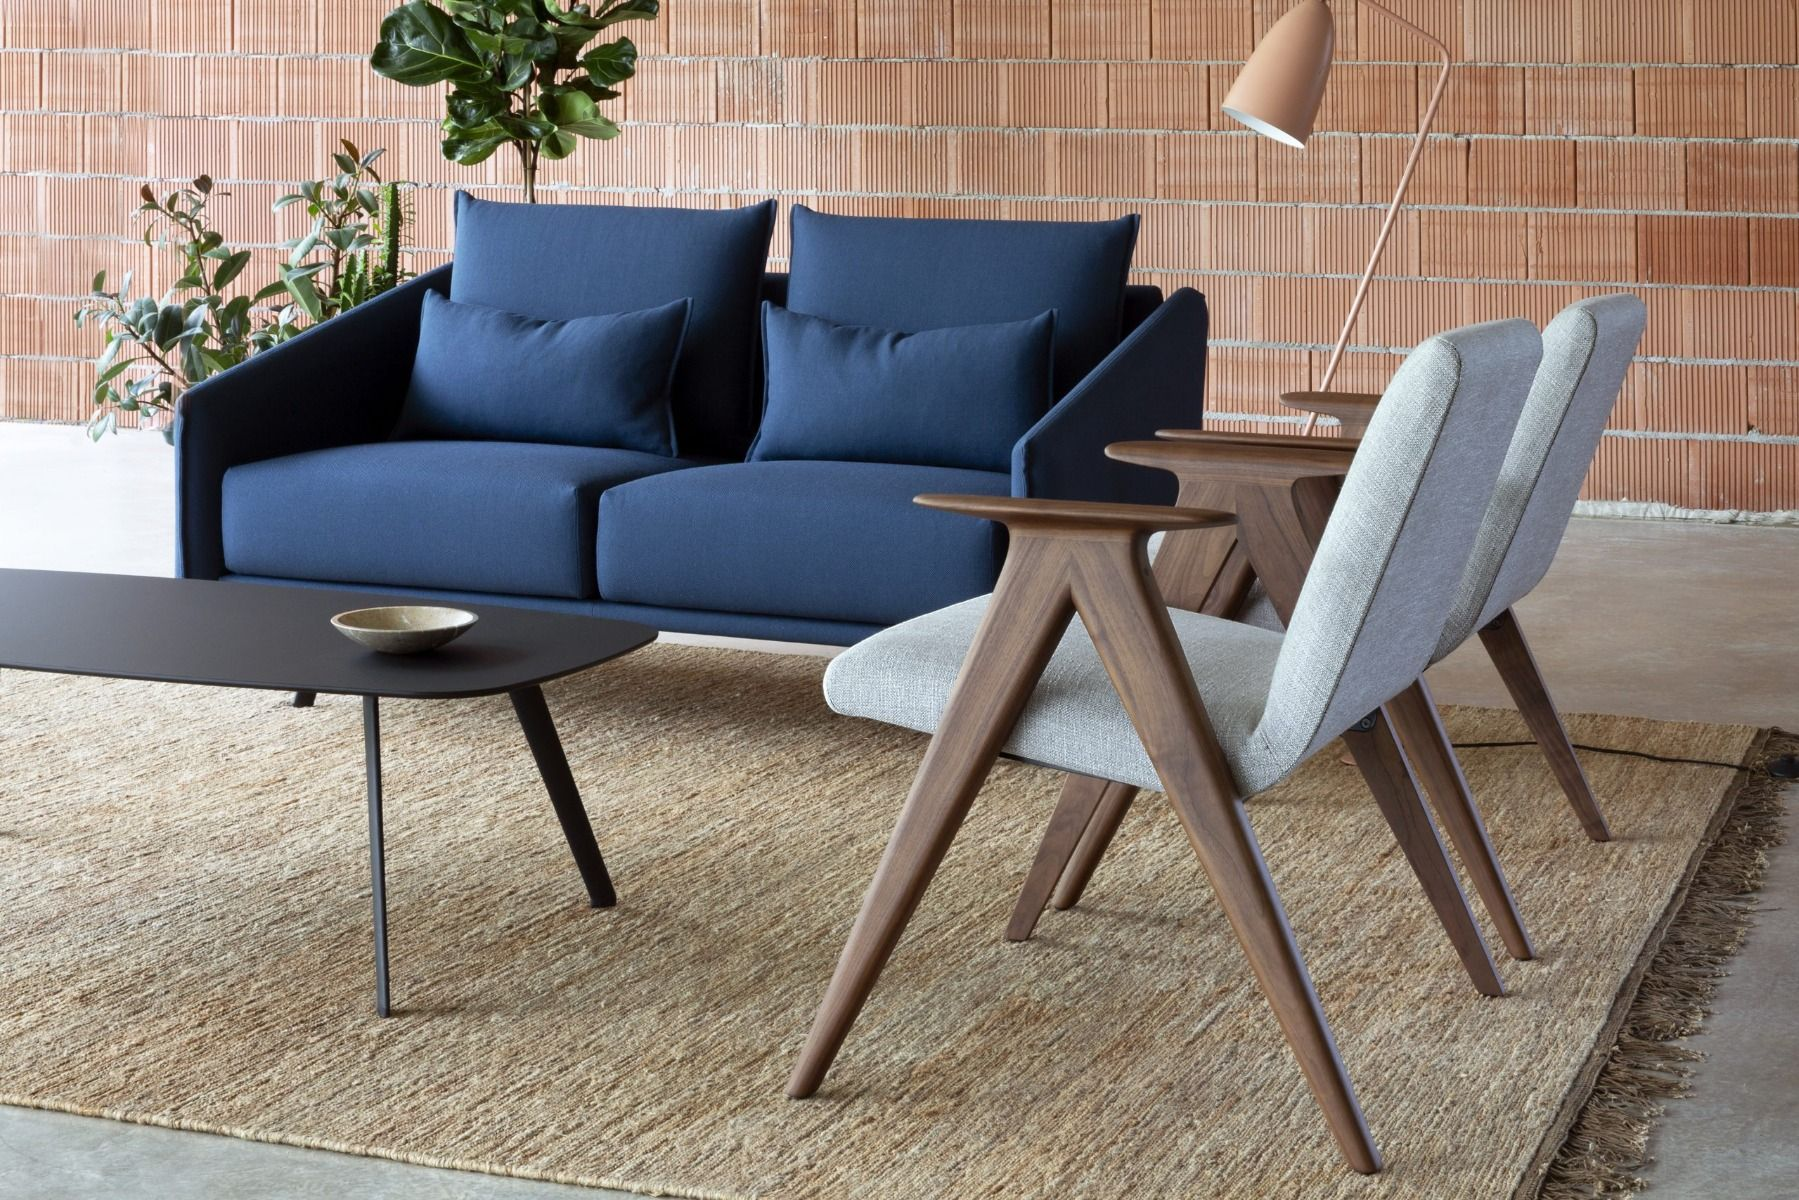 STUA Costura Sofa - 2 Seater